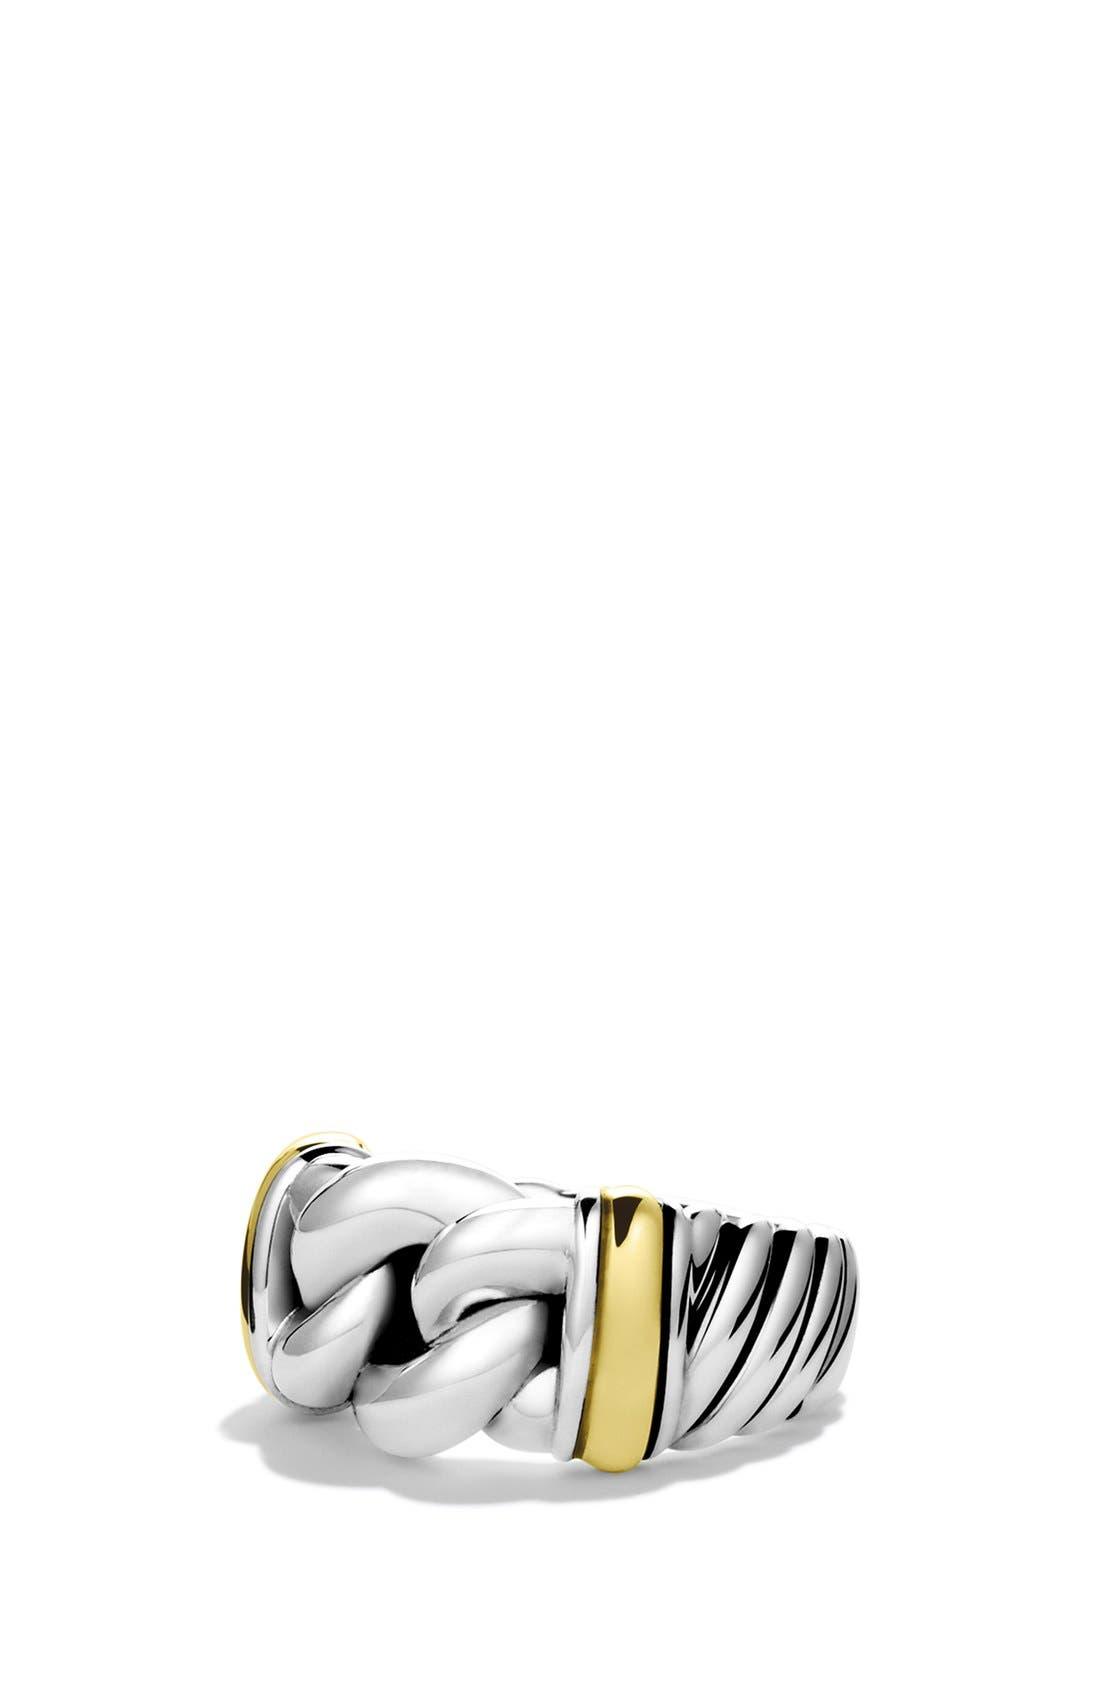 DAVID YURMAN 'Metro' Ring with Gold, Main, color, 040